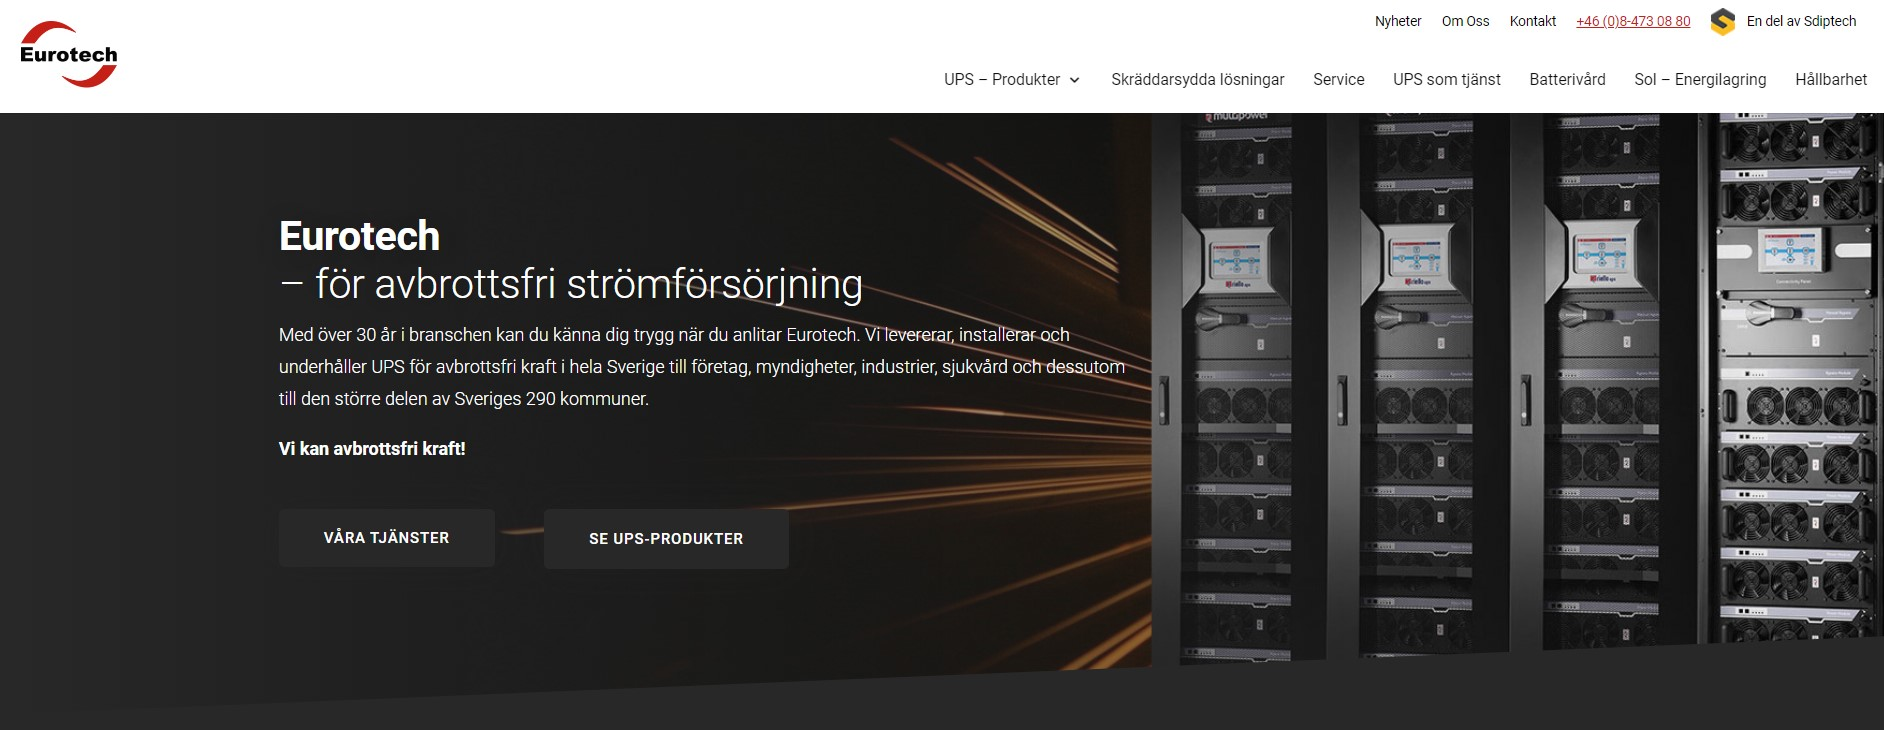 Eurotechs nya hemsida